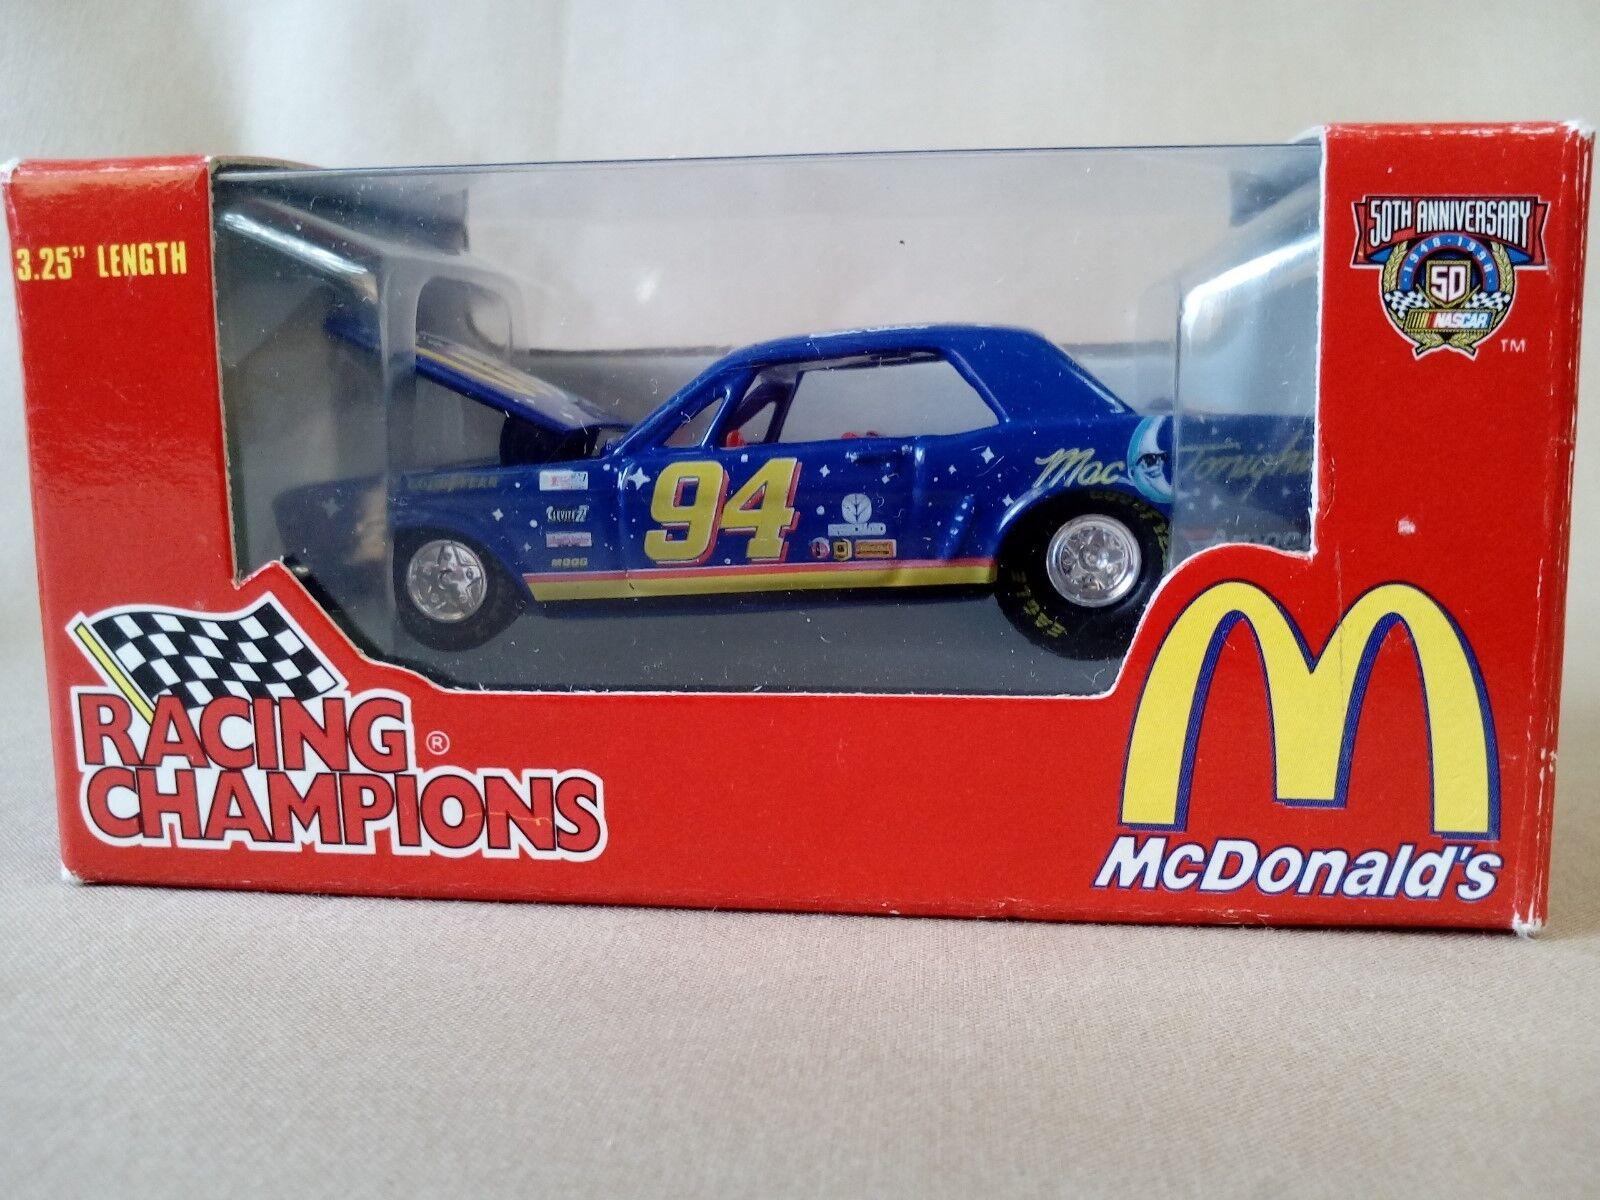 Racing Champions McDonalds Die Cast Car 1 64 Scale 1998 Bill Elliott Ford